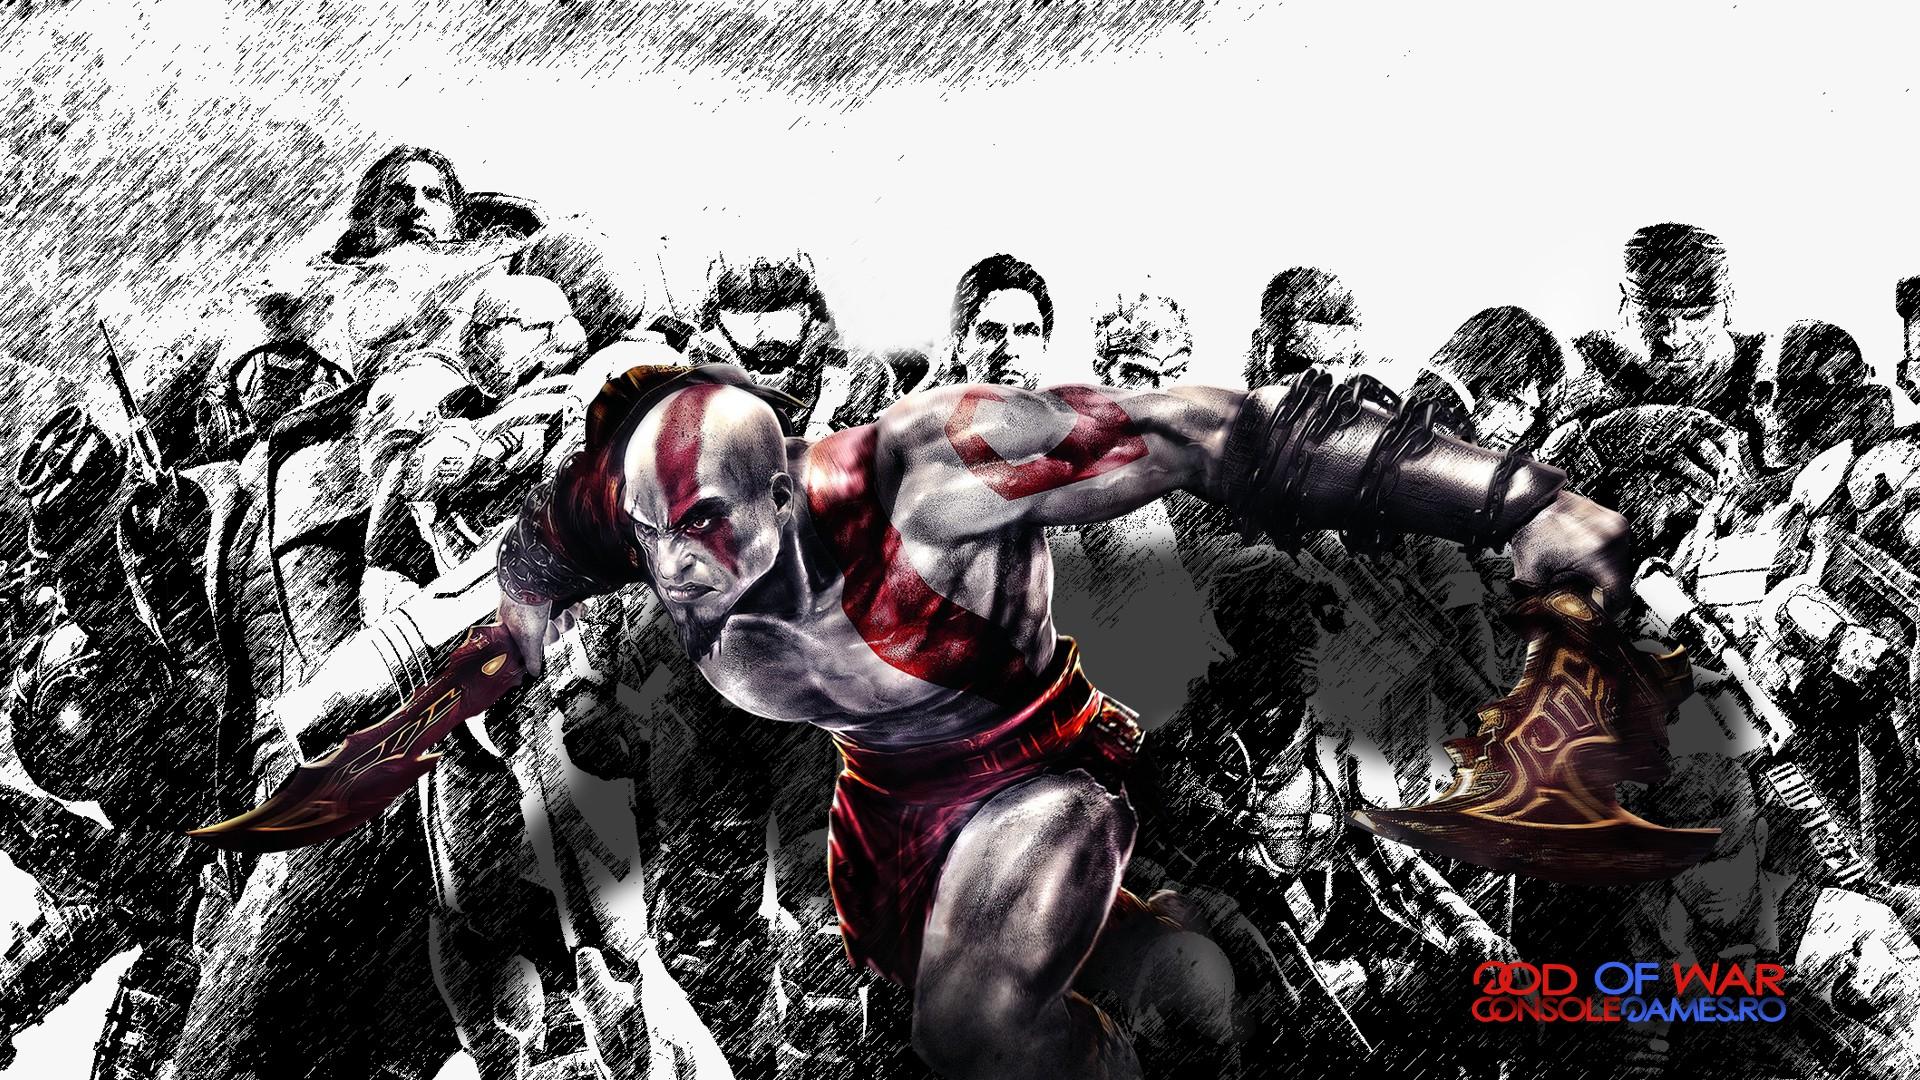 D Console Games Wallpapers Kratos God Of War Ascension Console Games Wallpaper V